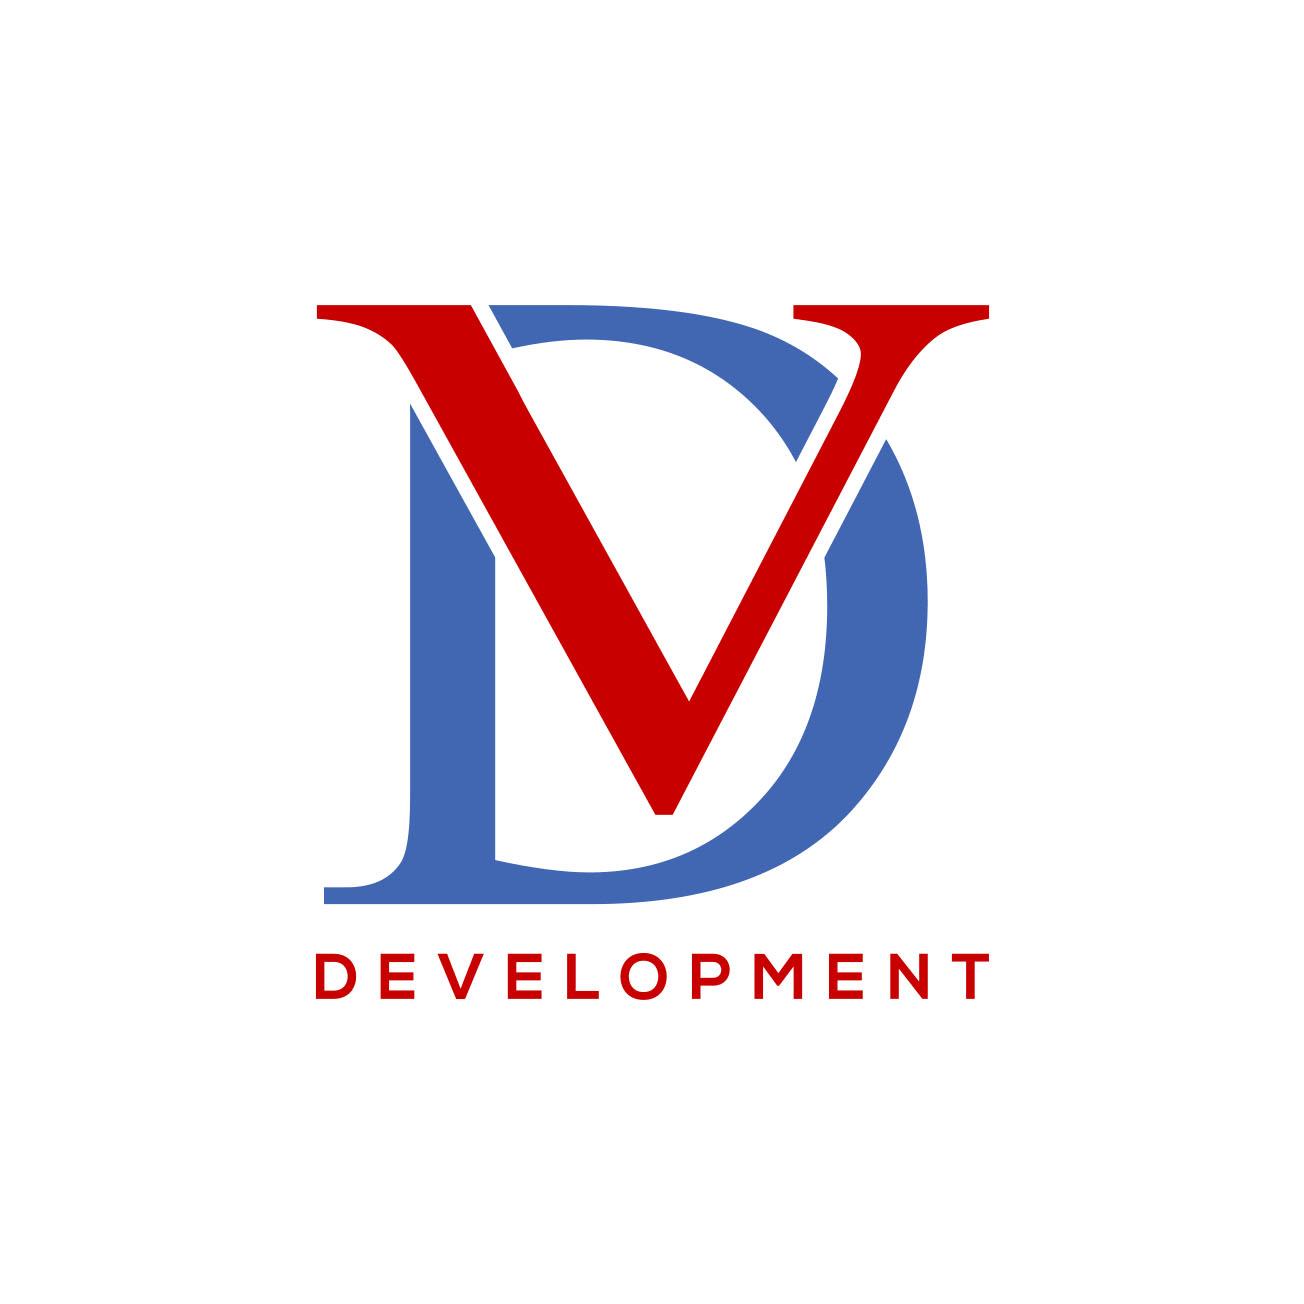 Dv Development